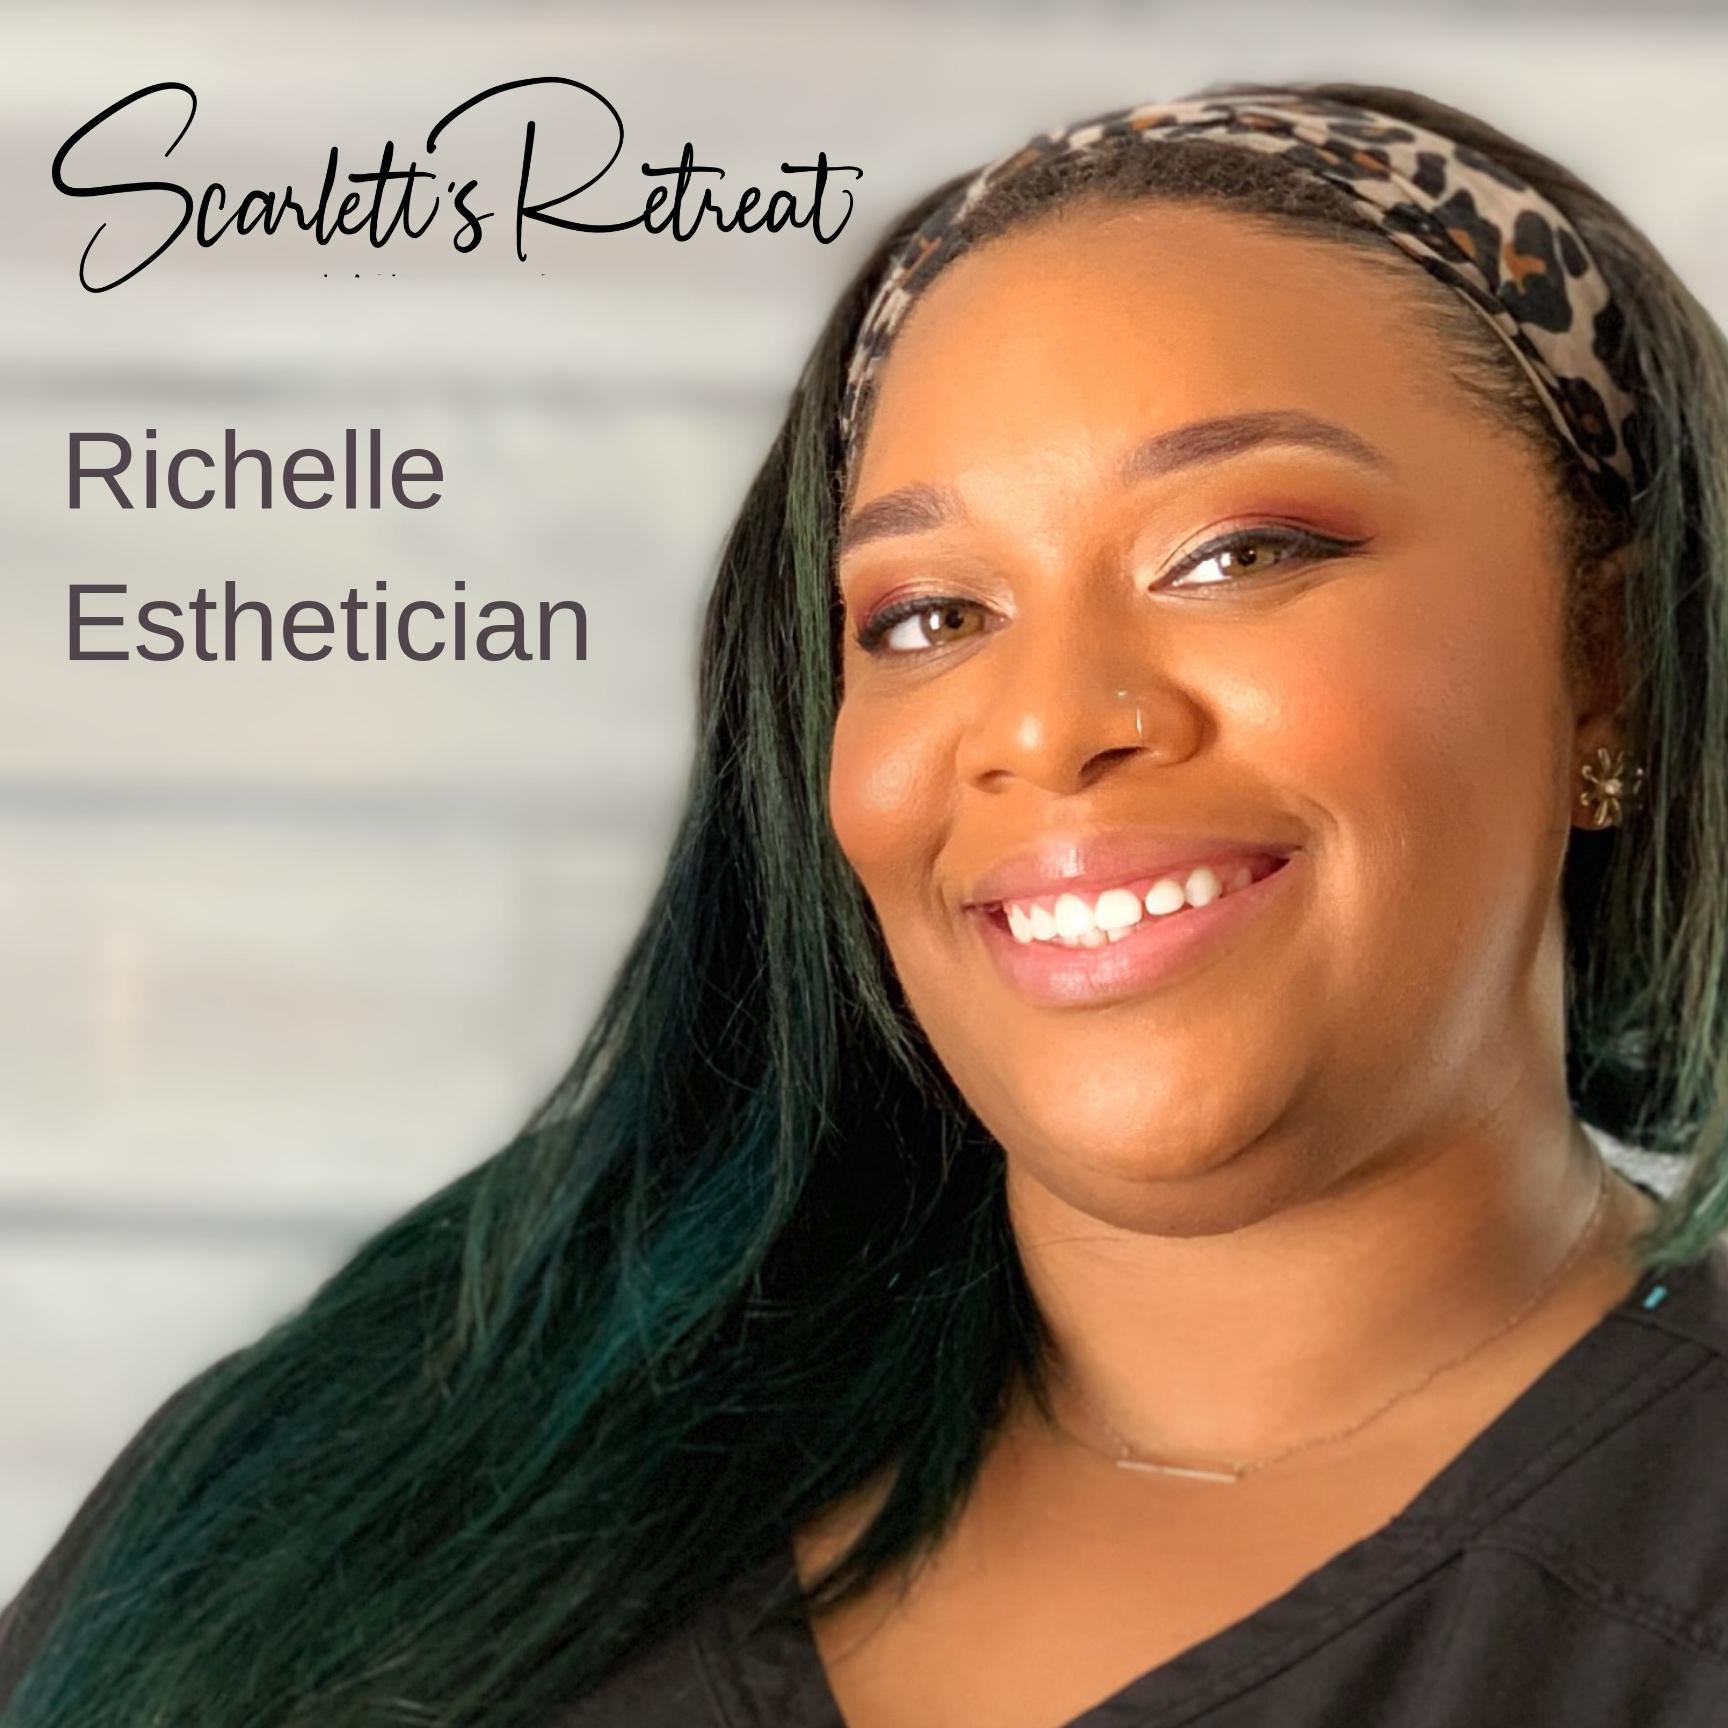 Richelle